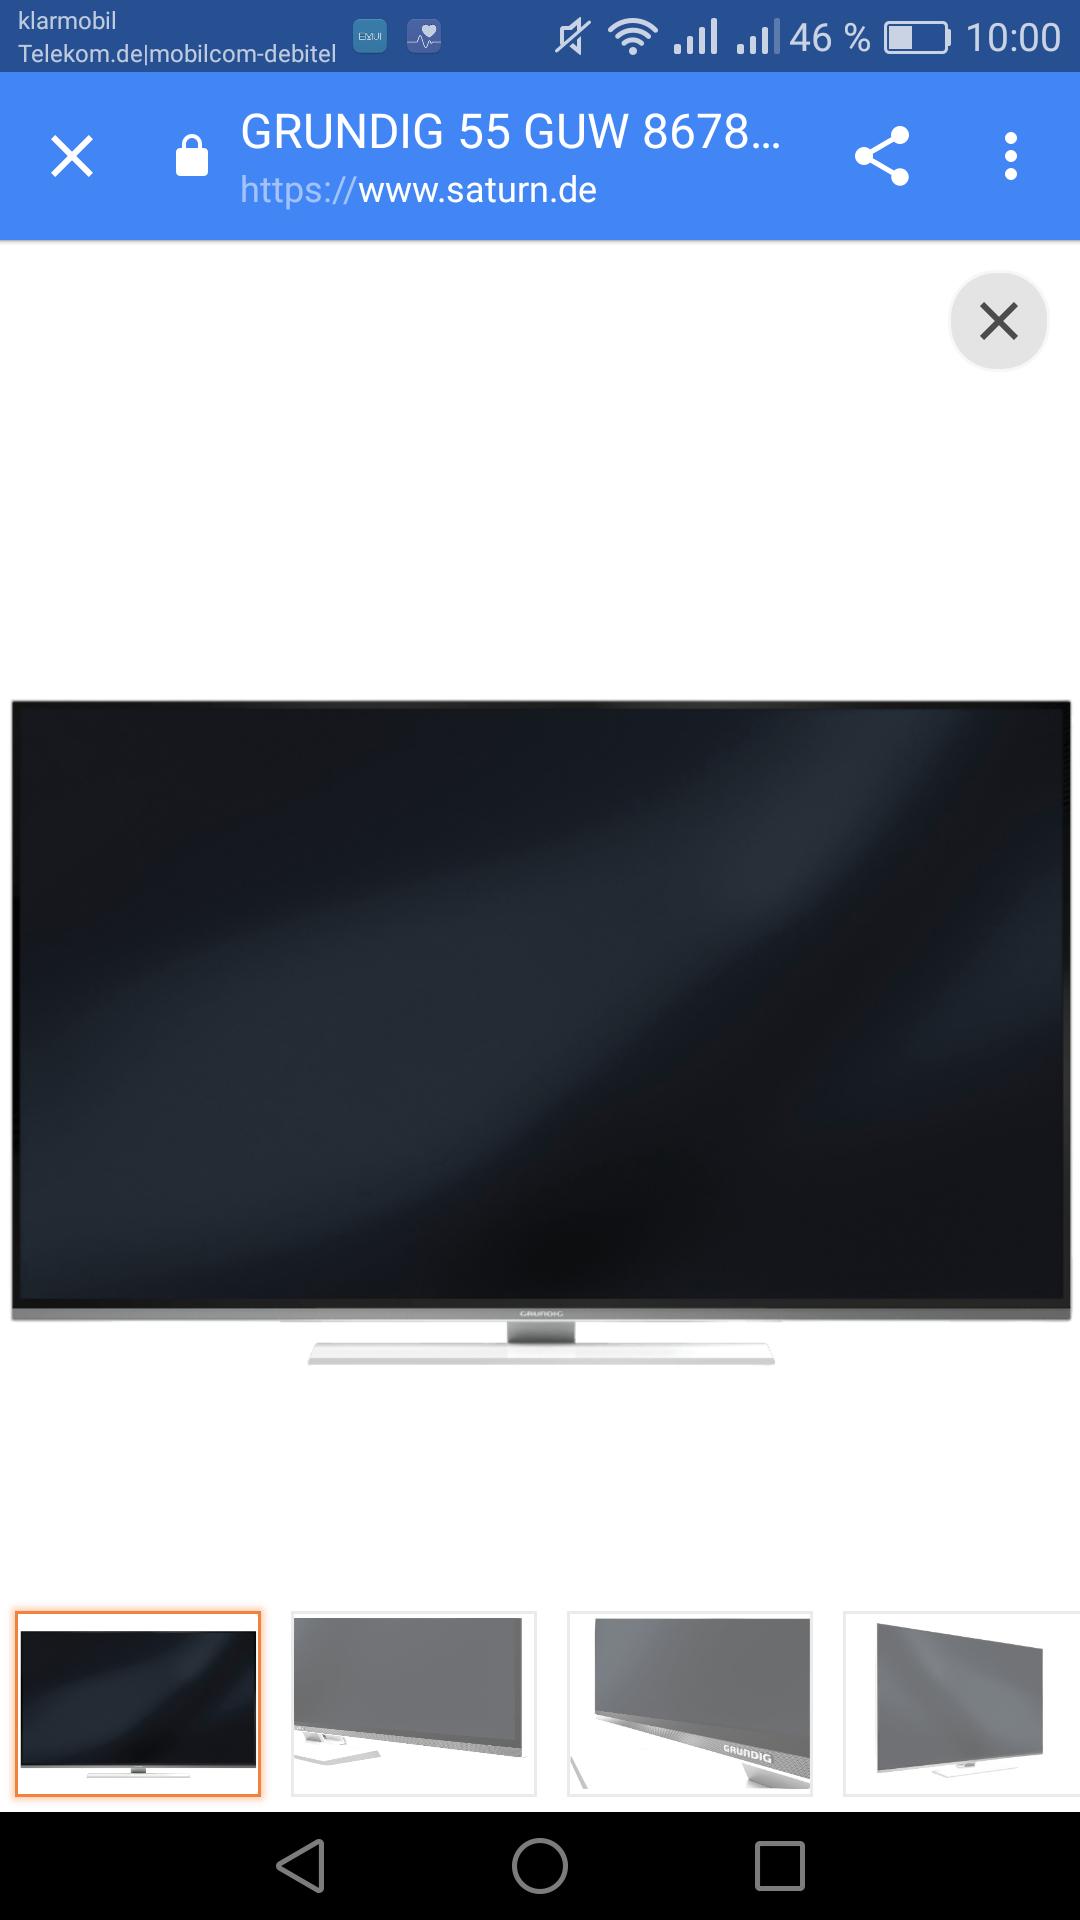 GRUNDIG 55 GUW 8678, 139 cm (55 Zoll), UHD 4K, SMART TV, LED TV,saturn (jetzt nur noch bei Abholung)